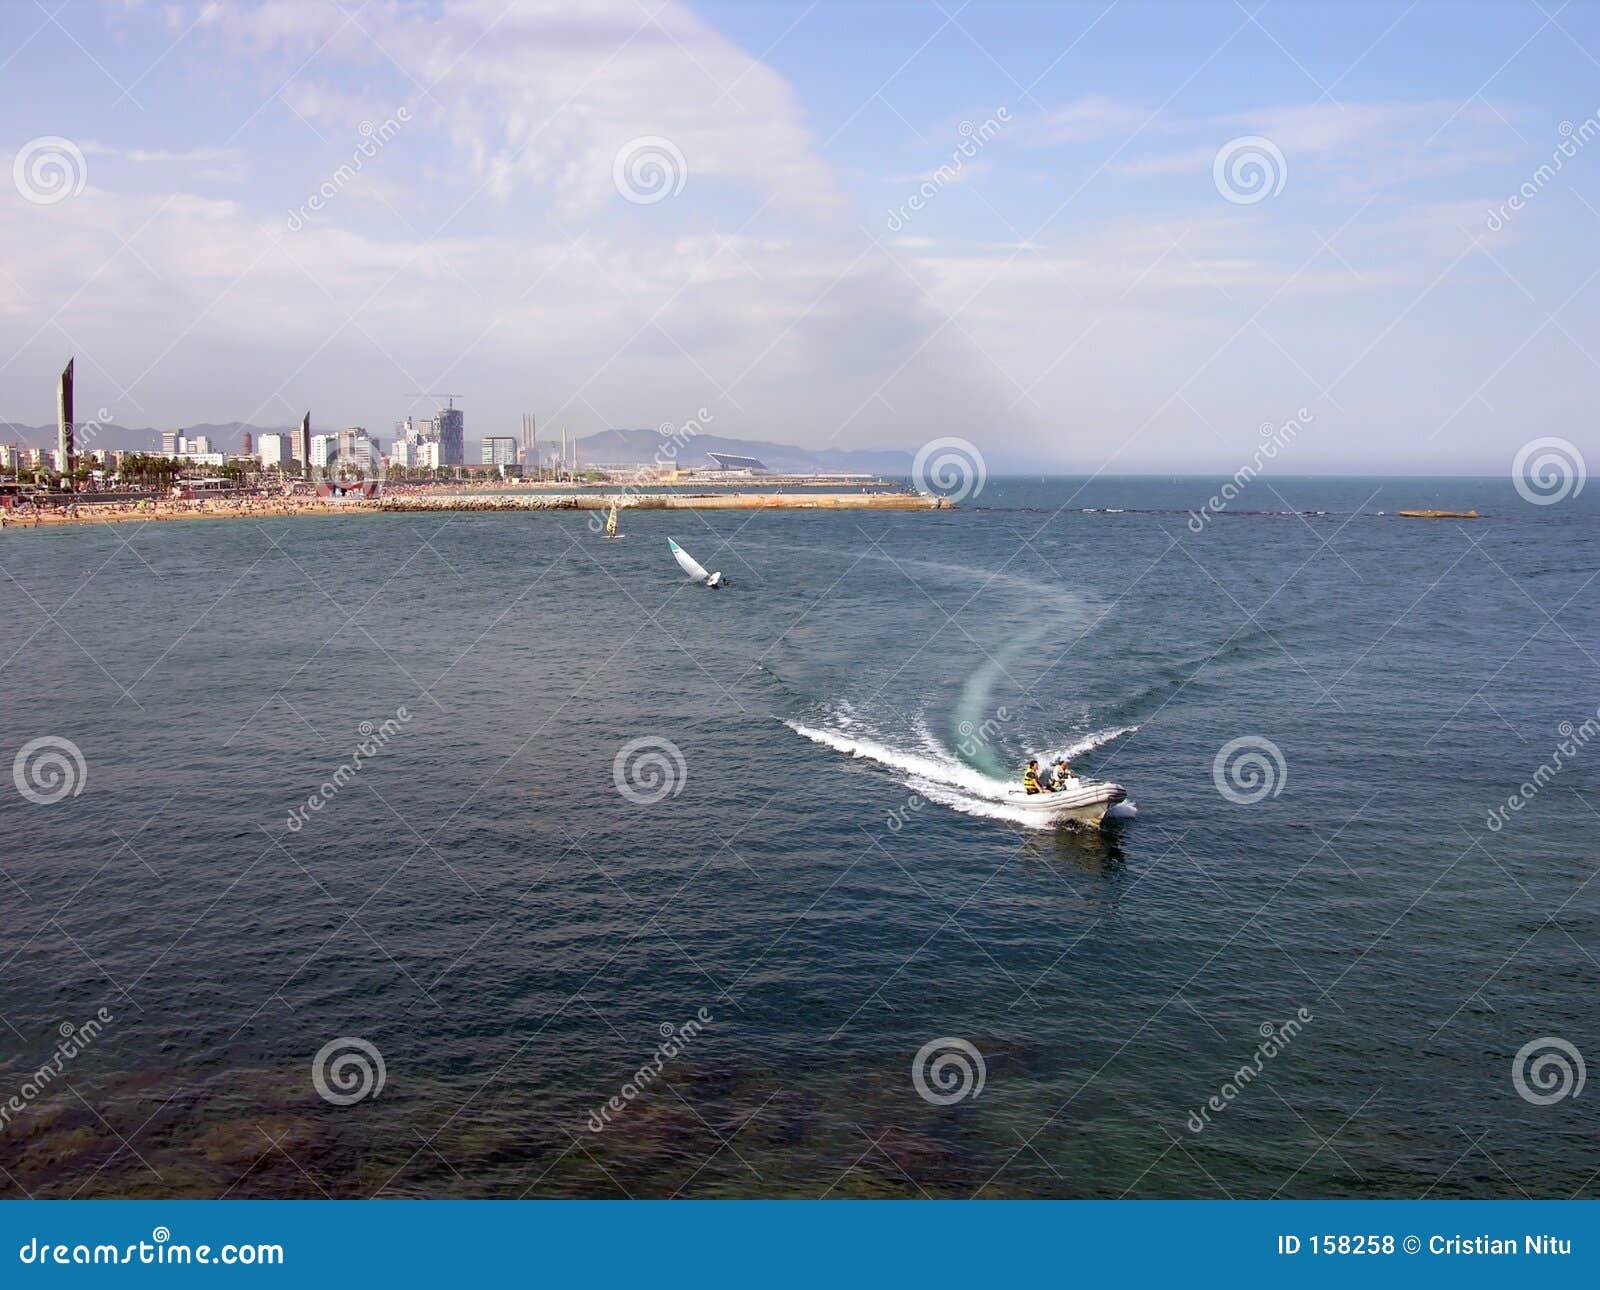 Speed Boat - Barcelona Coastline